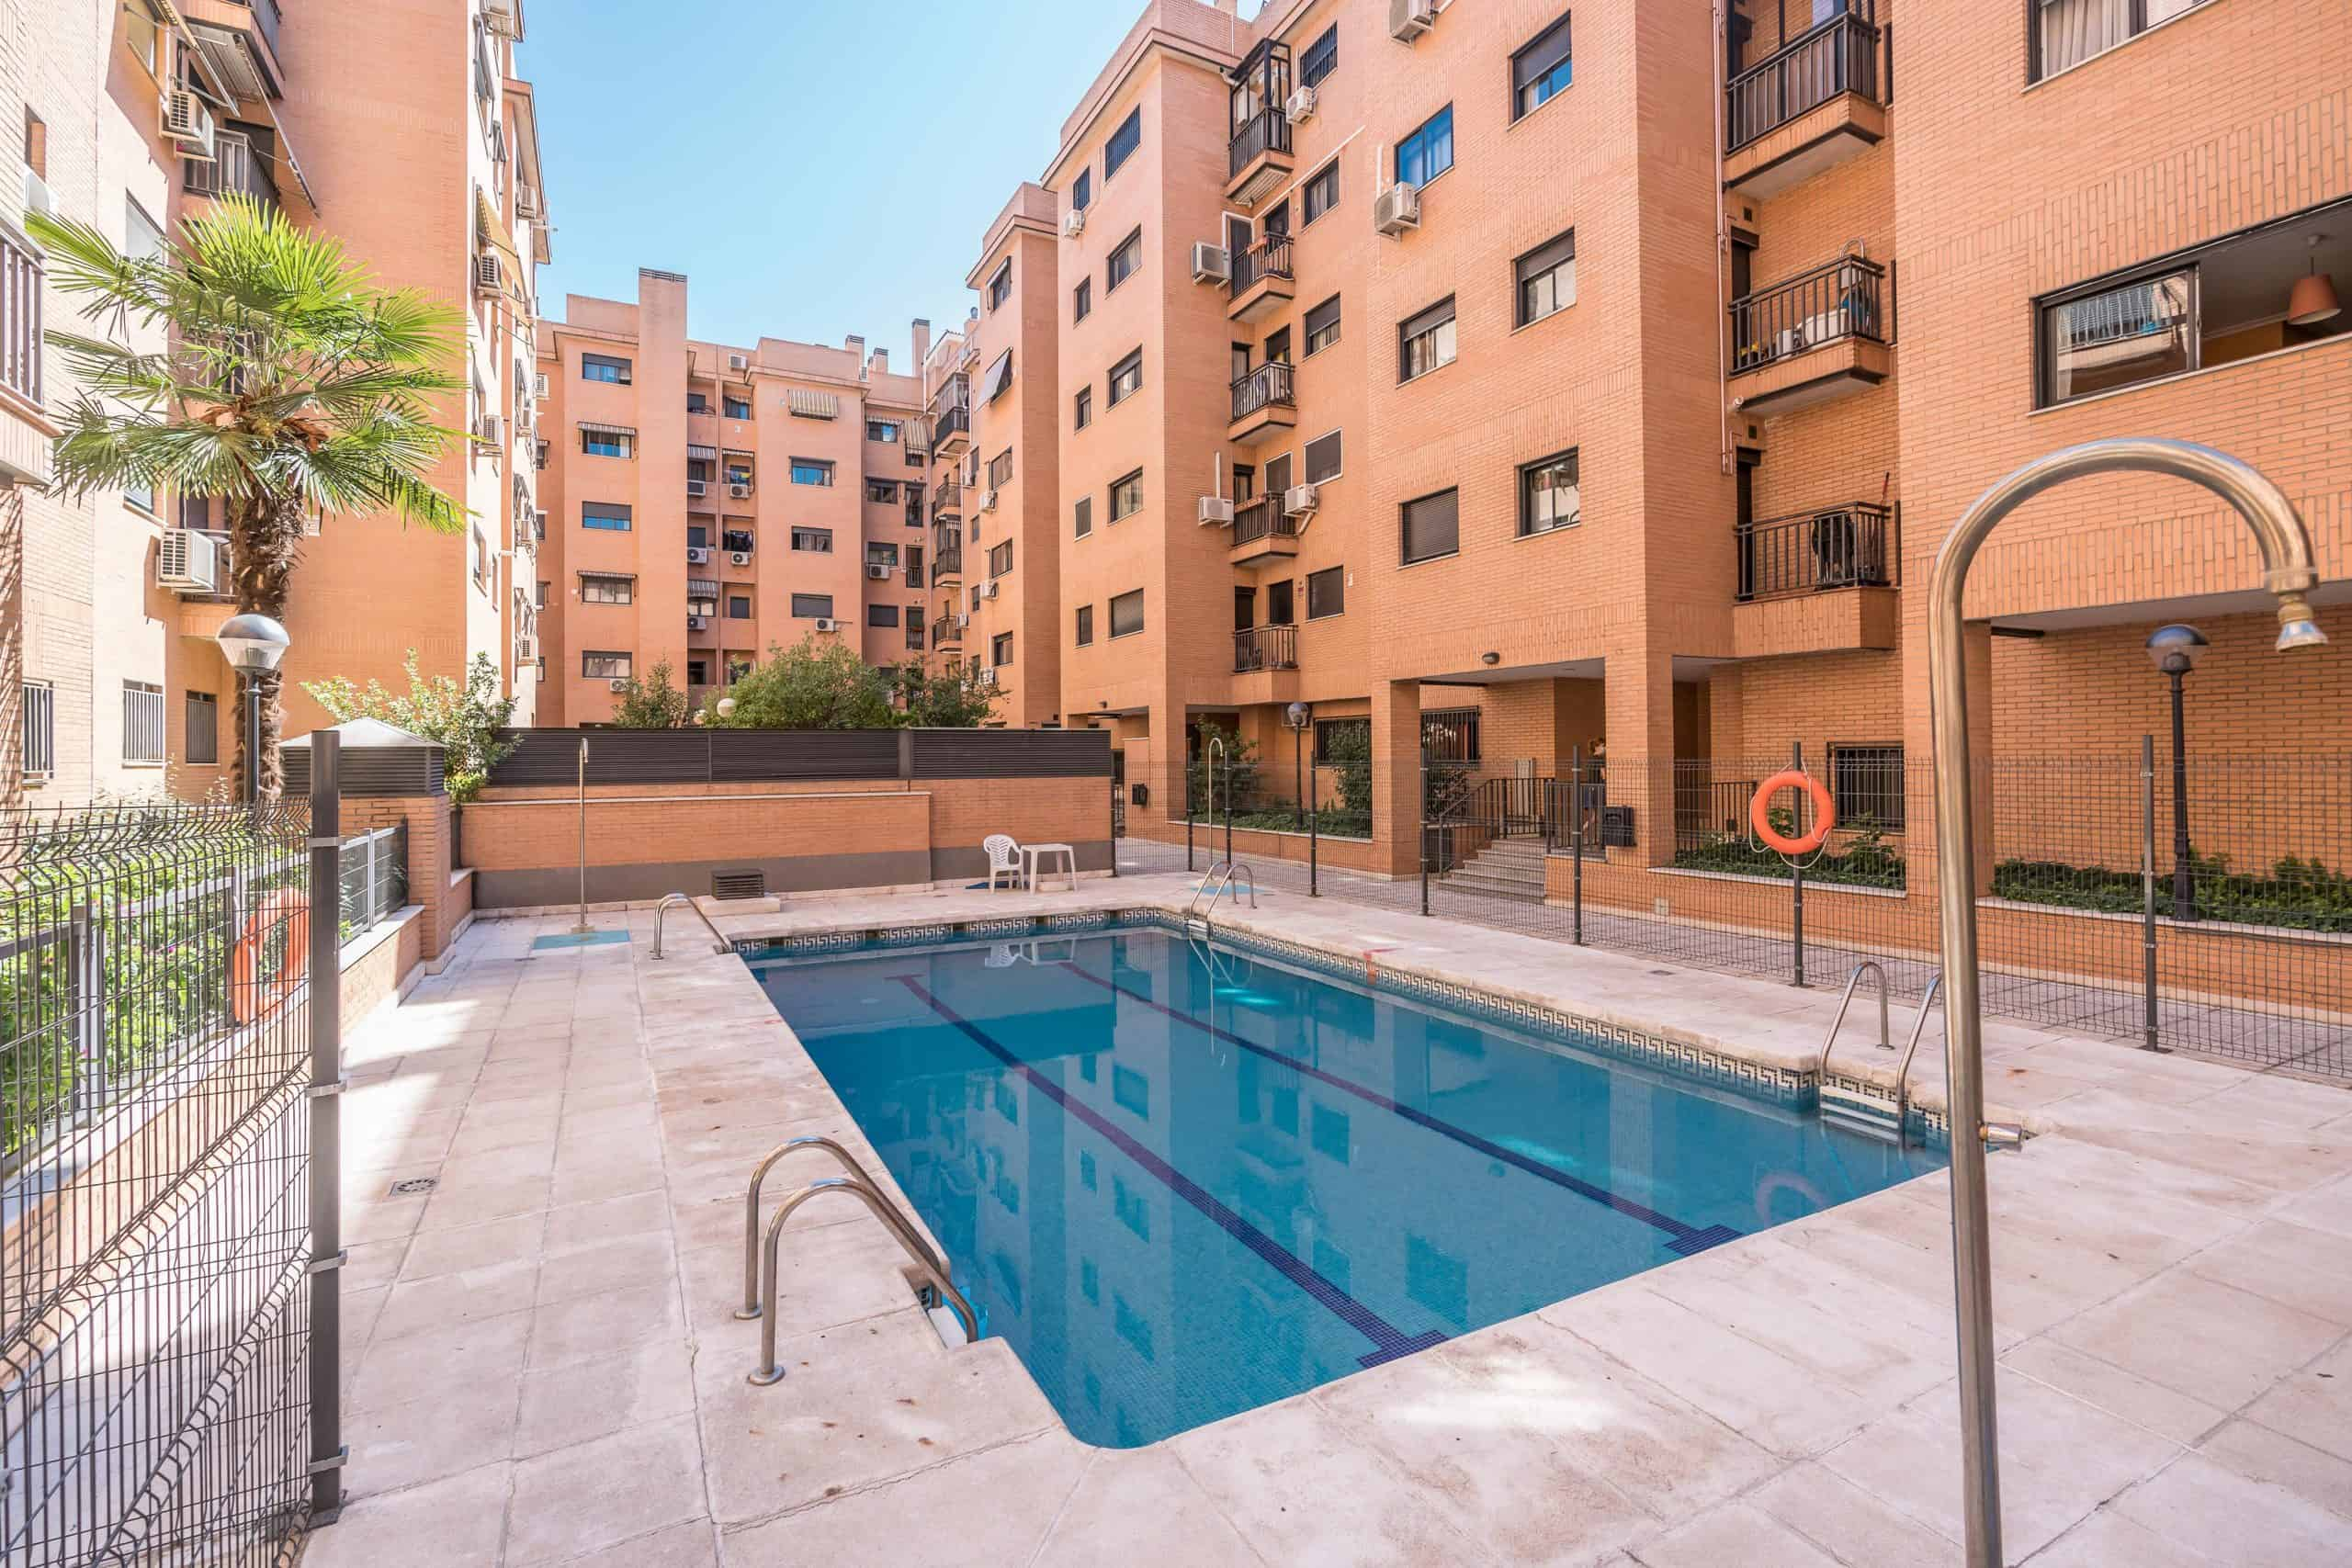 Agencia Inmobiliaria de Madrid-FUTUROCASA-Zona ARGANZUELA-EMBAJADORES-LEGAZPI13 ZONAS COMUNES (1)